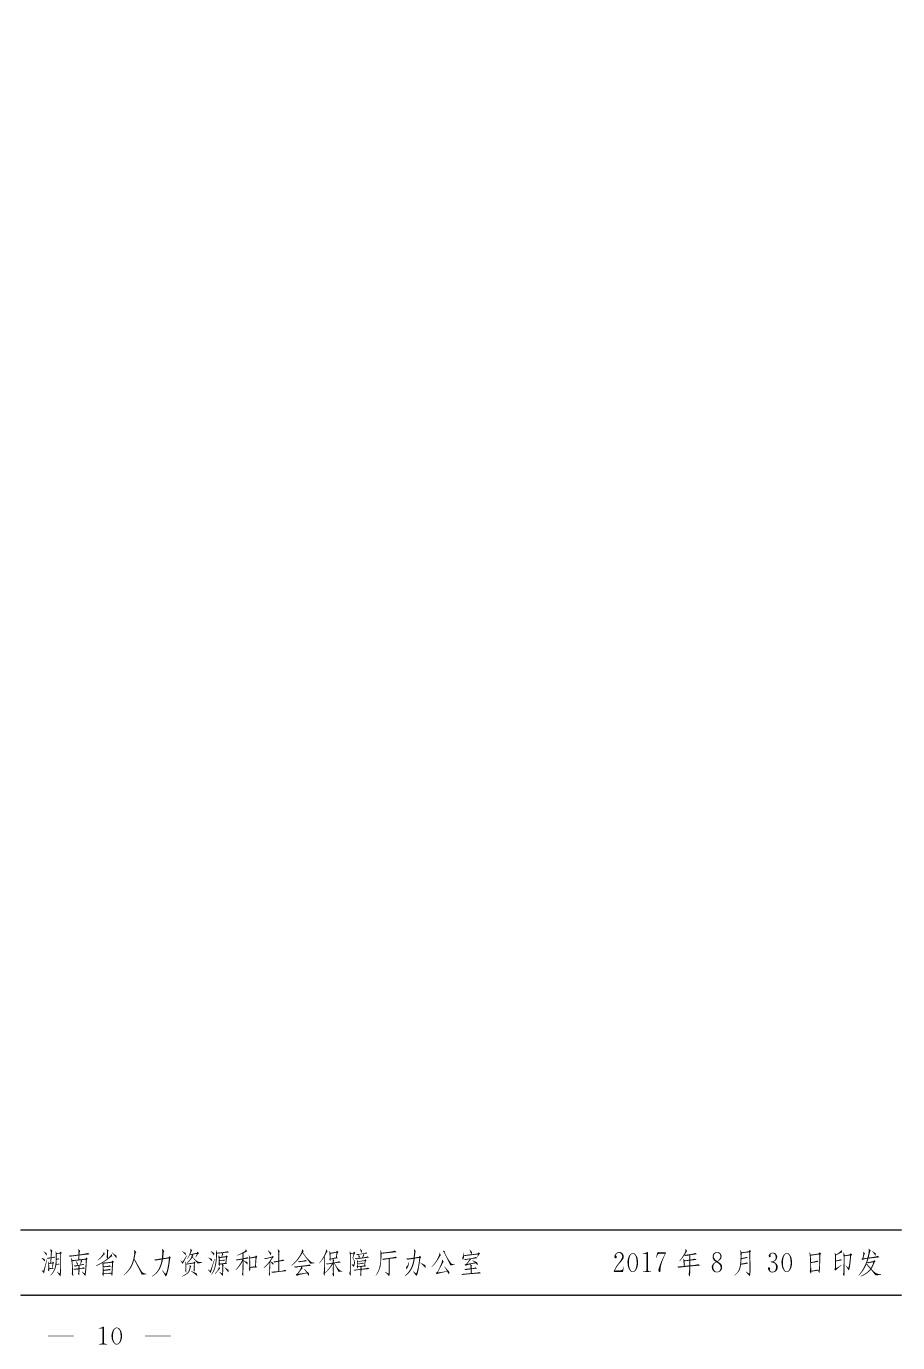 betball贝博软件下载|贝博安卓|贝博app苹果版人社厅《关于支持和鼓励事业单位专业技术人员创新创业的实施意见》10